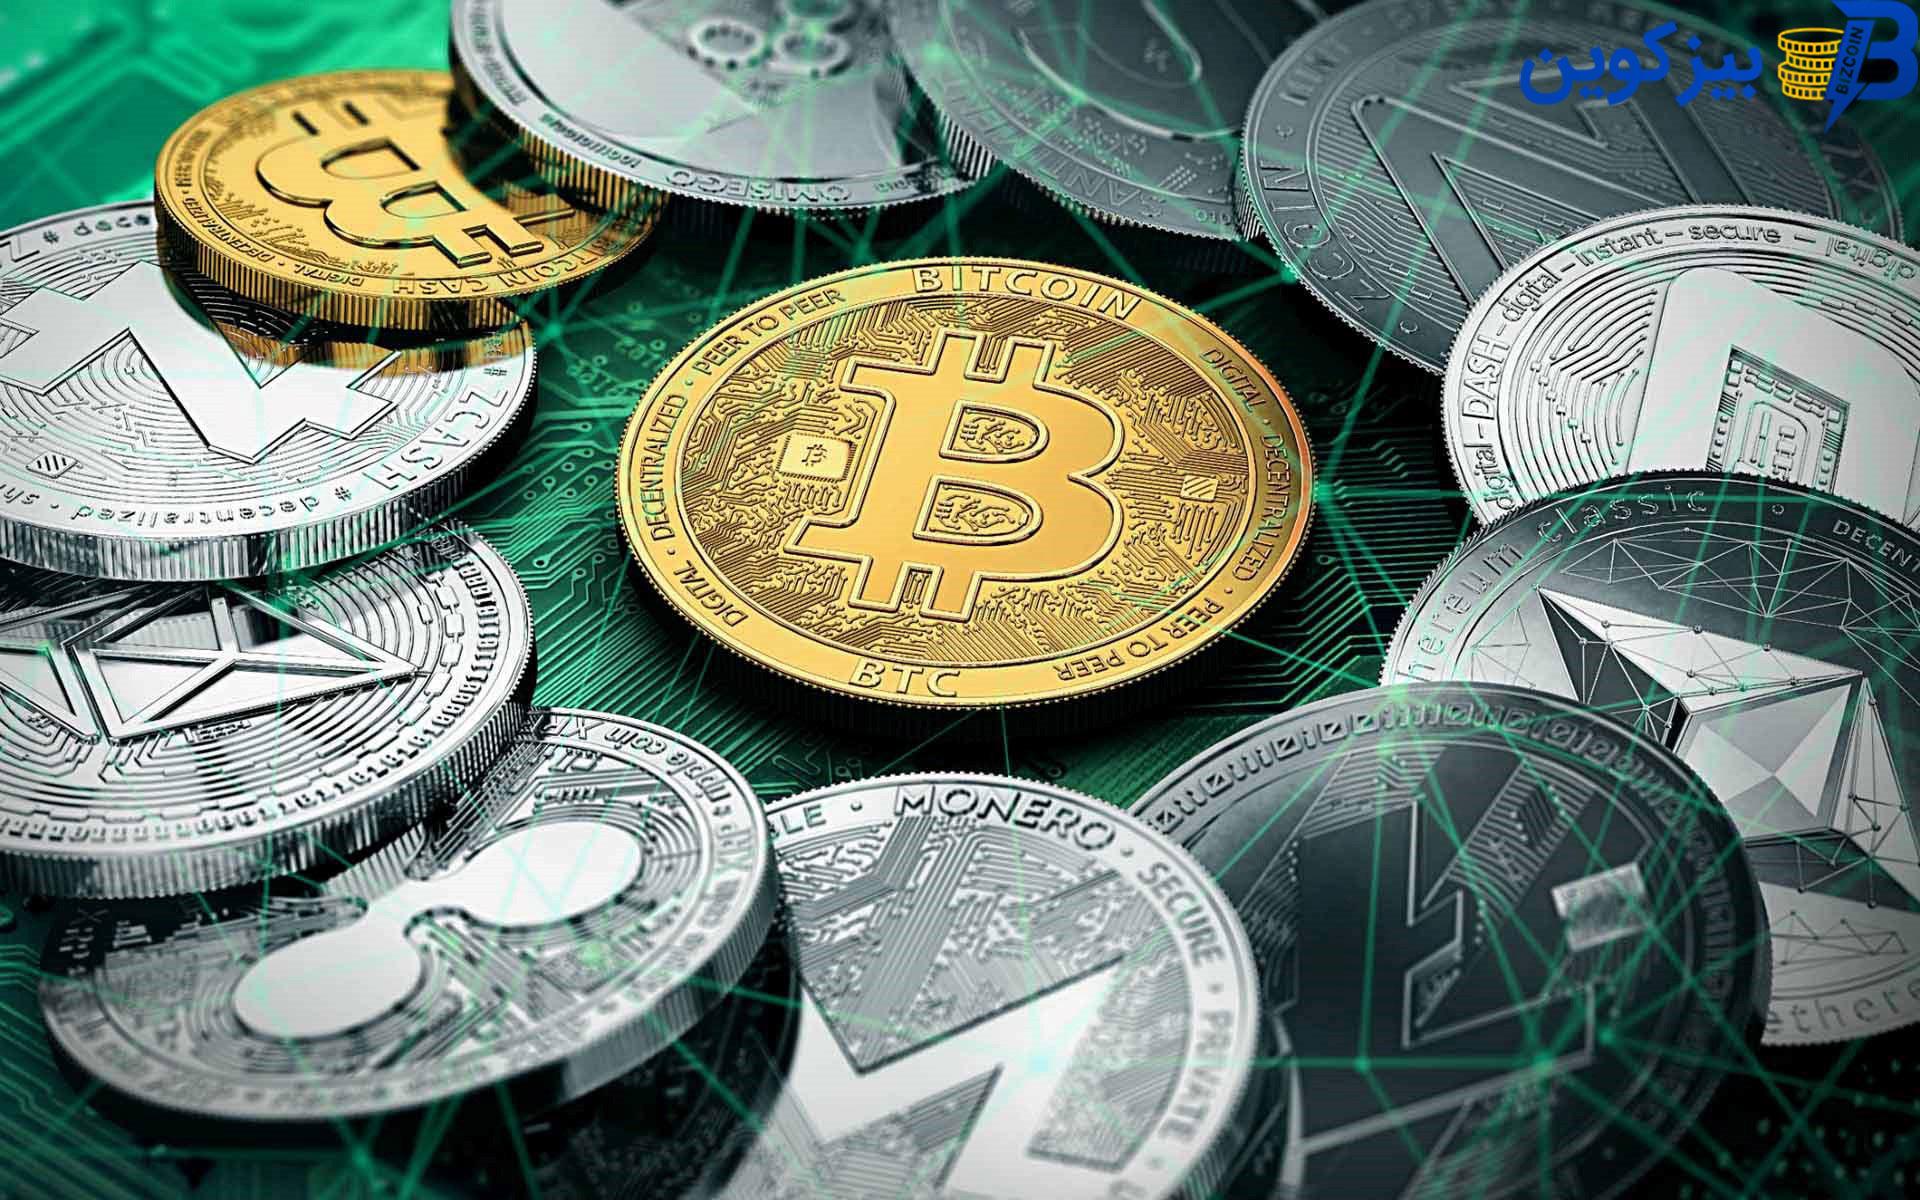 crypto currency services 3 دنیای بزرگ خدمات ارزهای دیجیتال